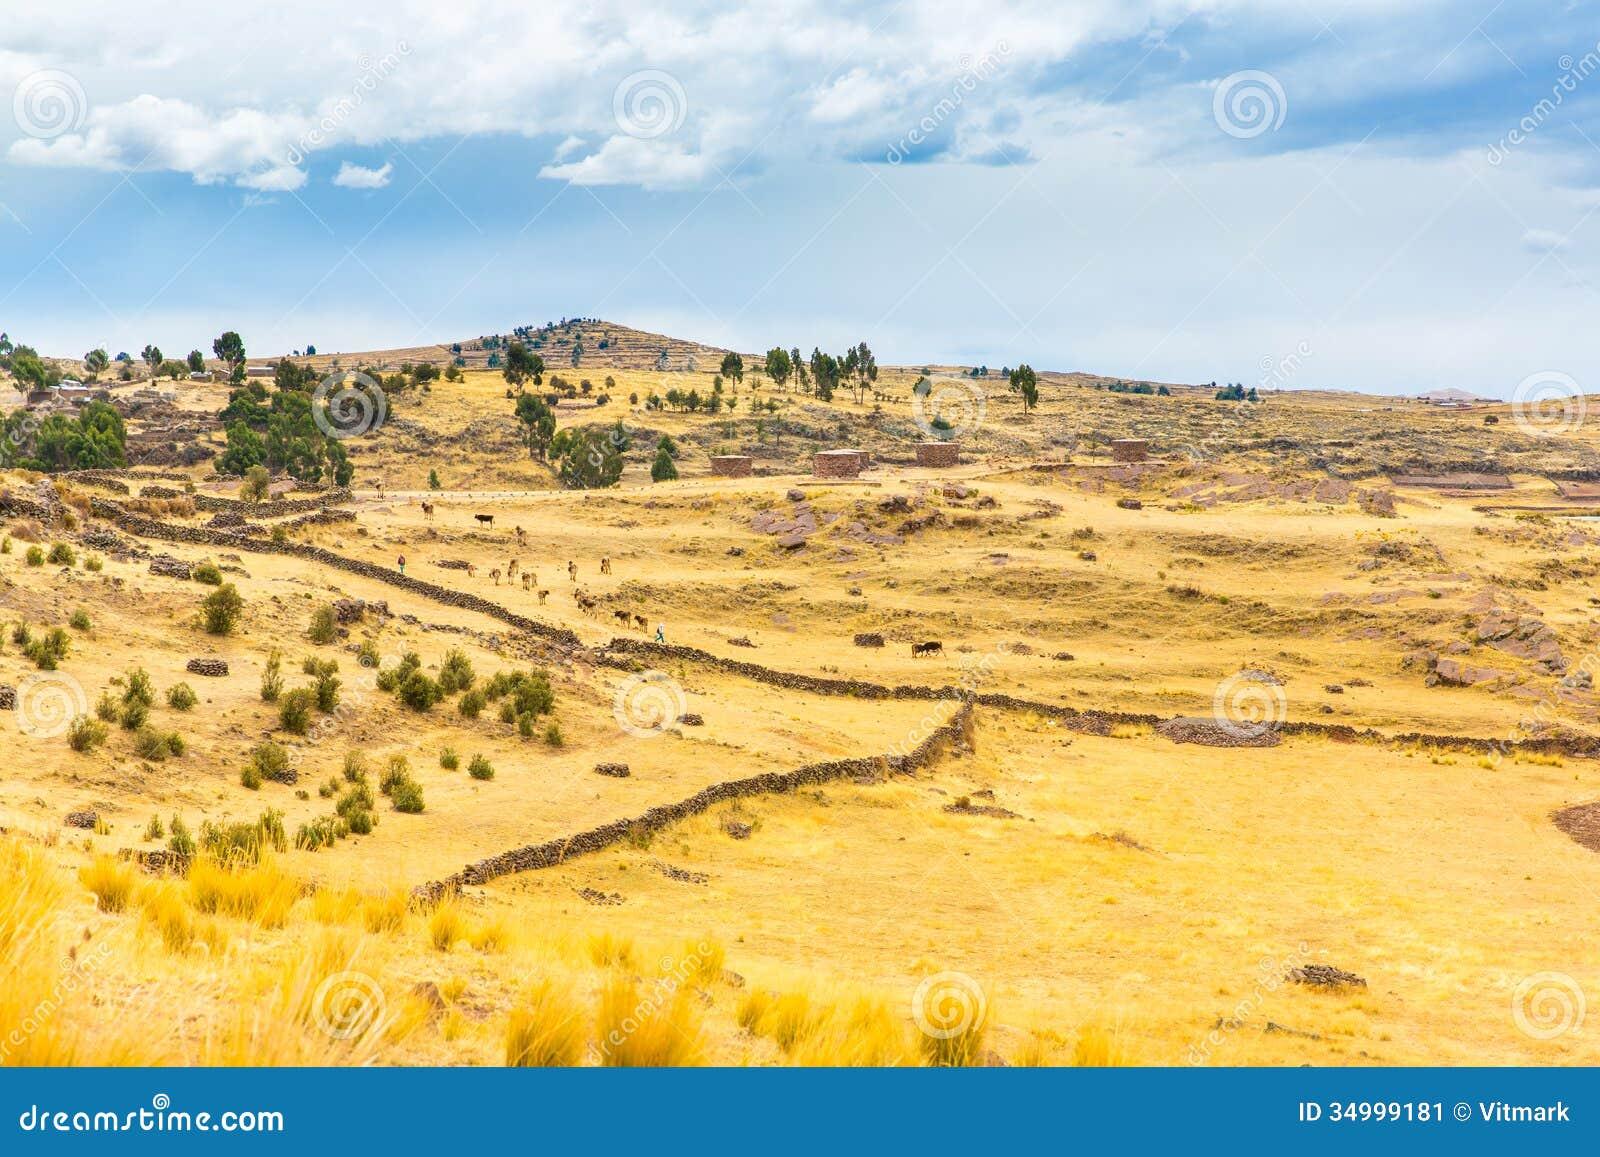 Funerary towers in Sillustani, Peru,South America- Inca prehistoric ruins near Puno